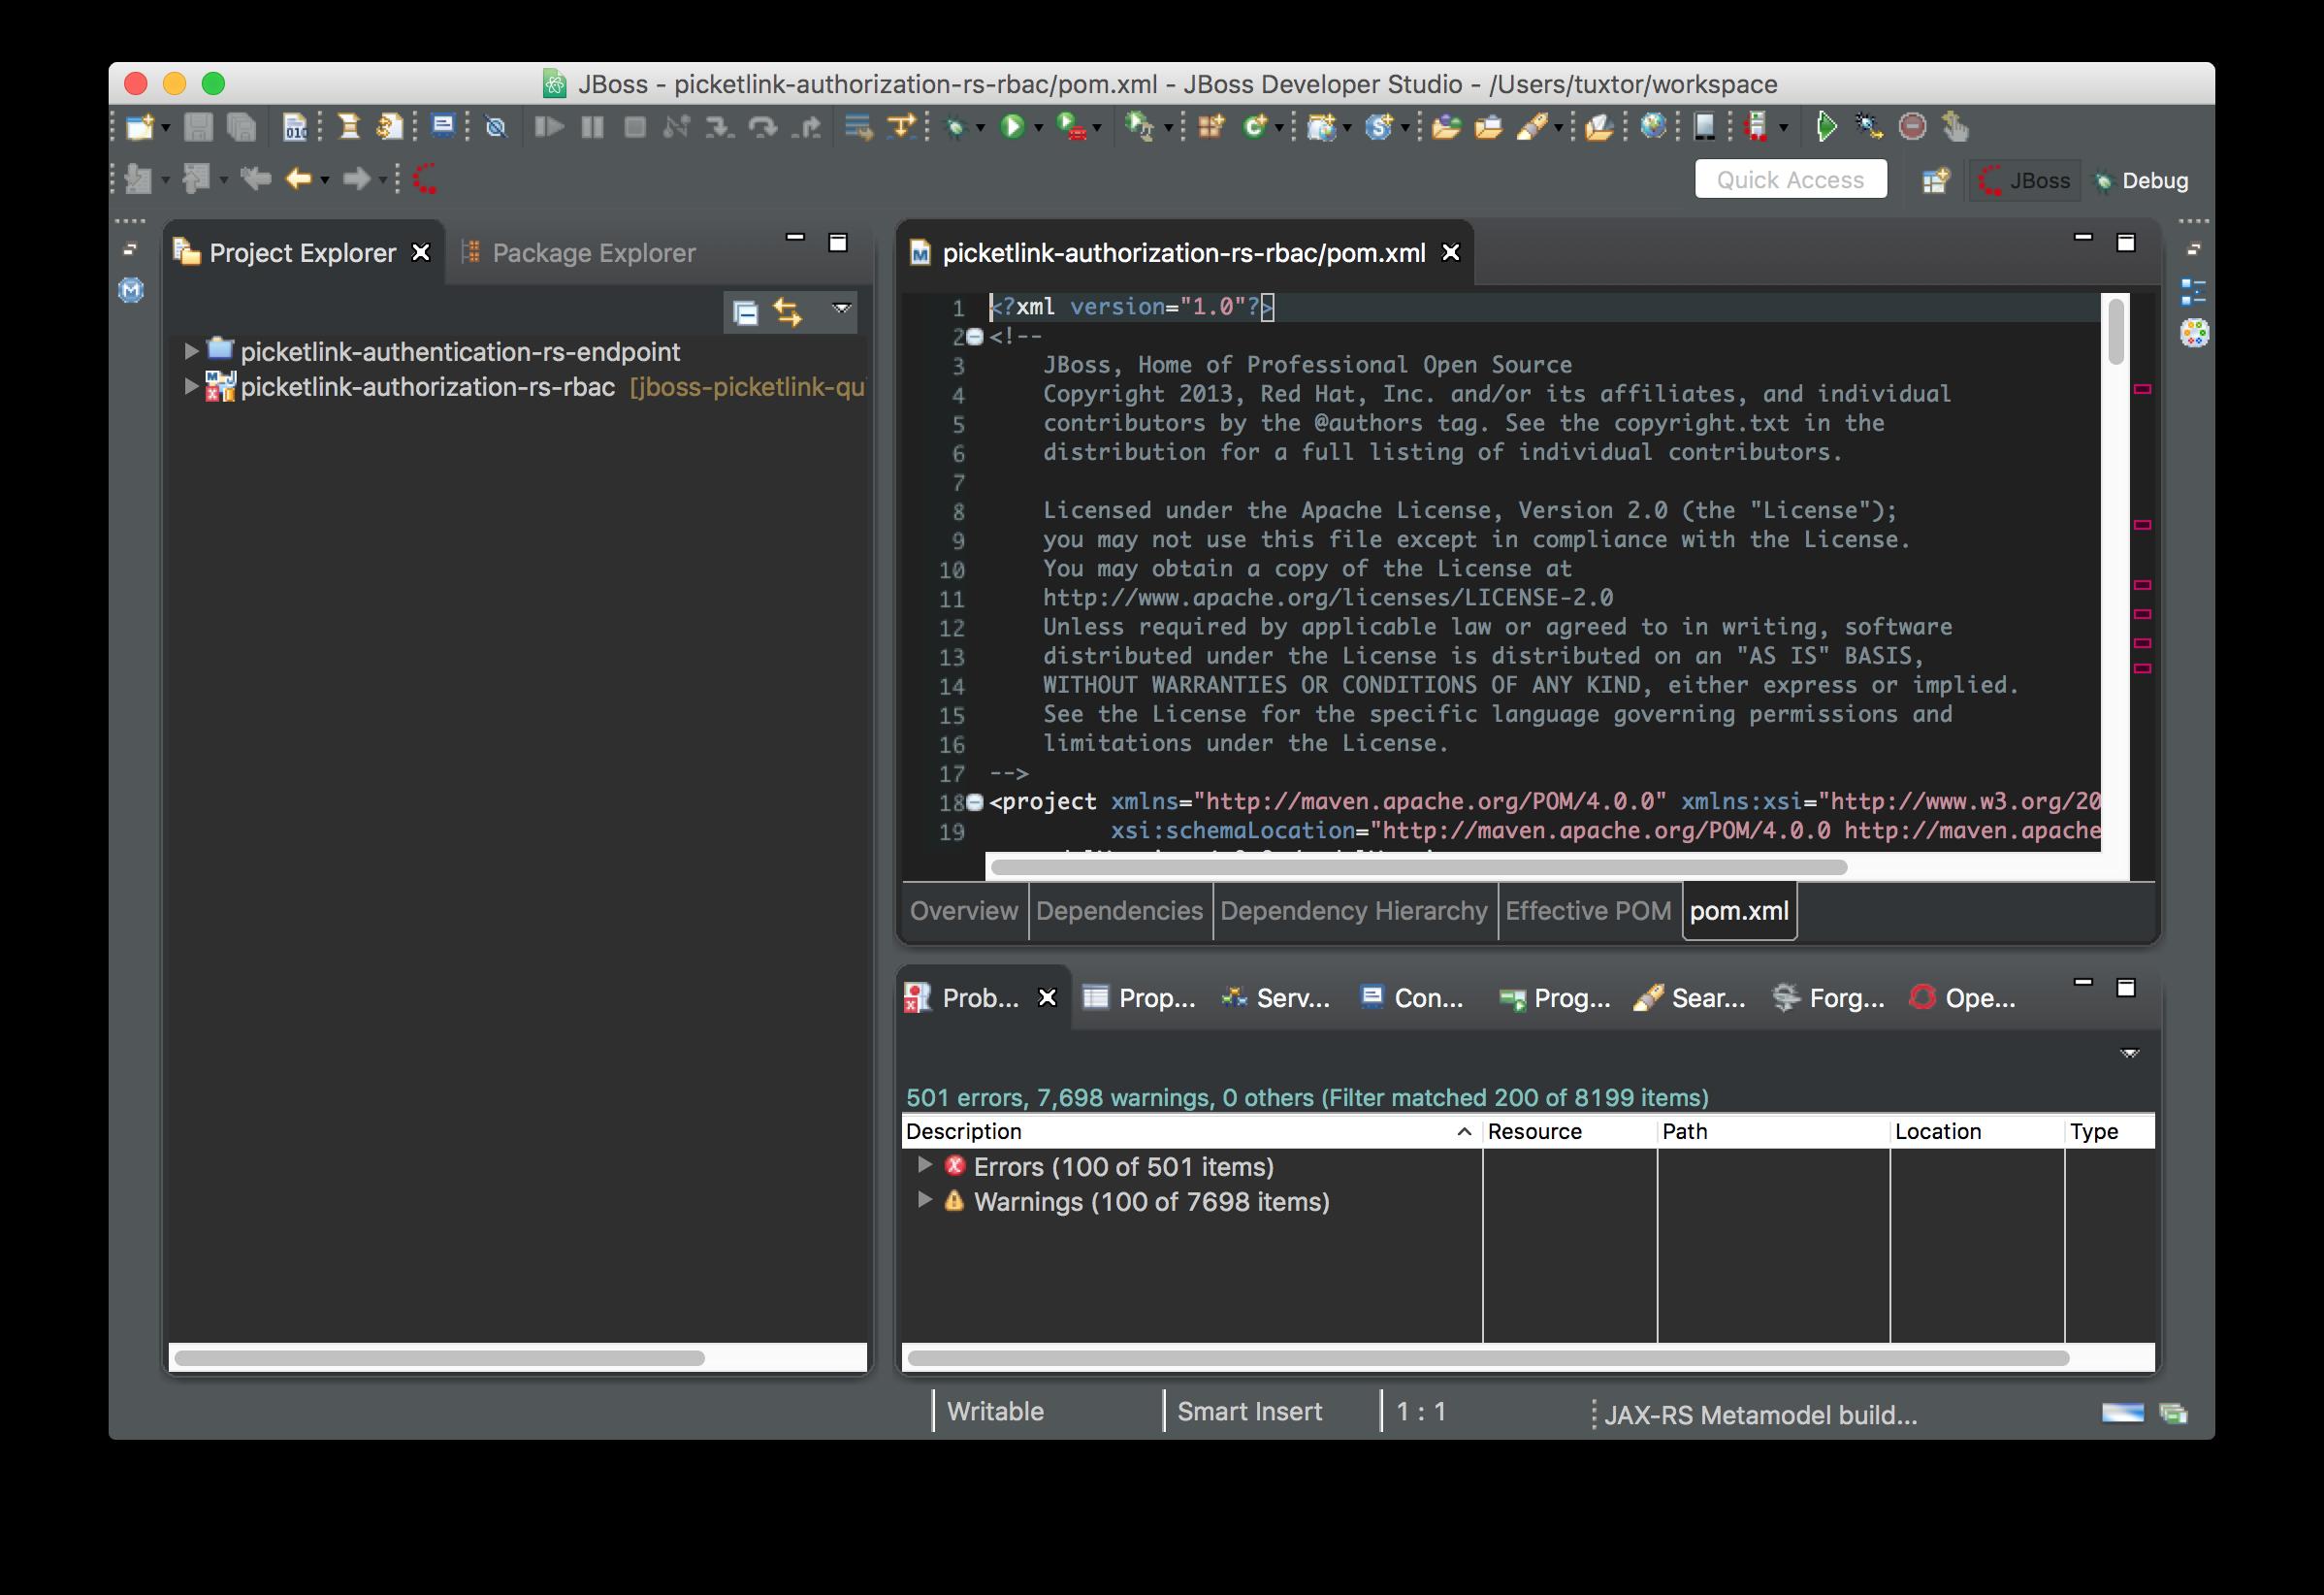 Quicktip Fix Font Size In Jboss Developer Studio And Osx